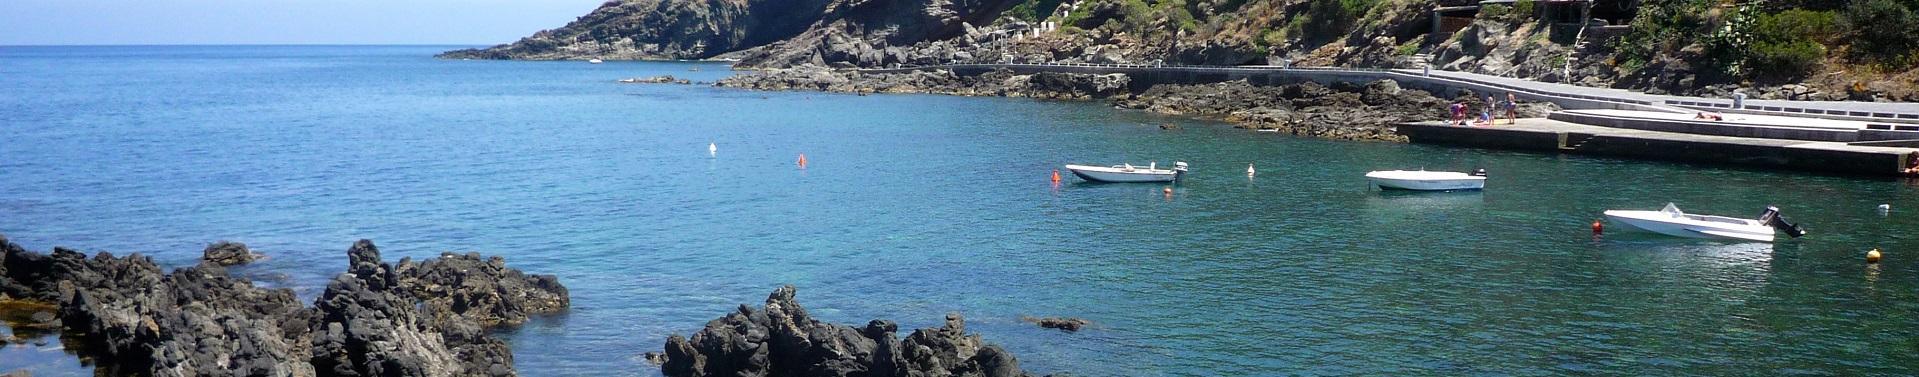 Ville e dammusi in Pantelleria